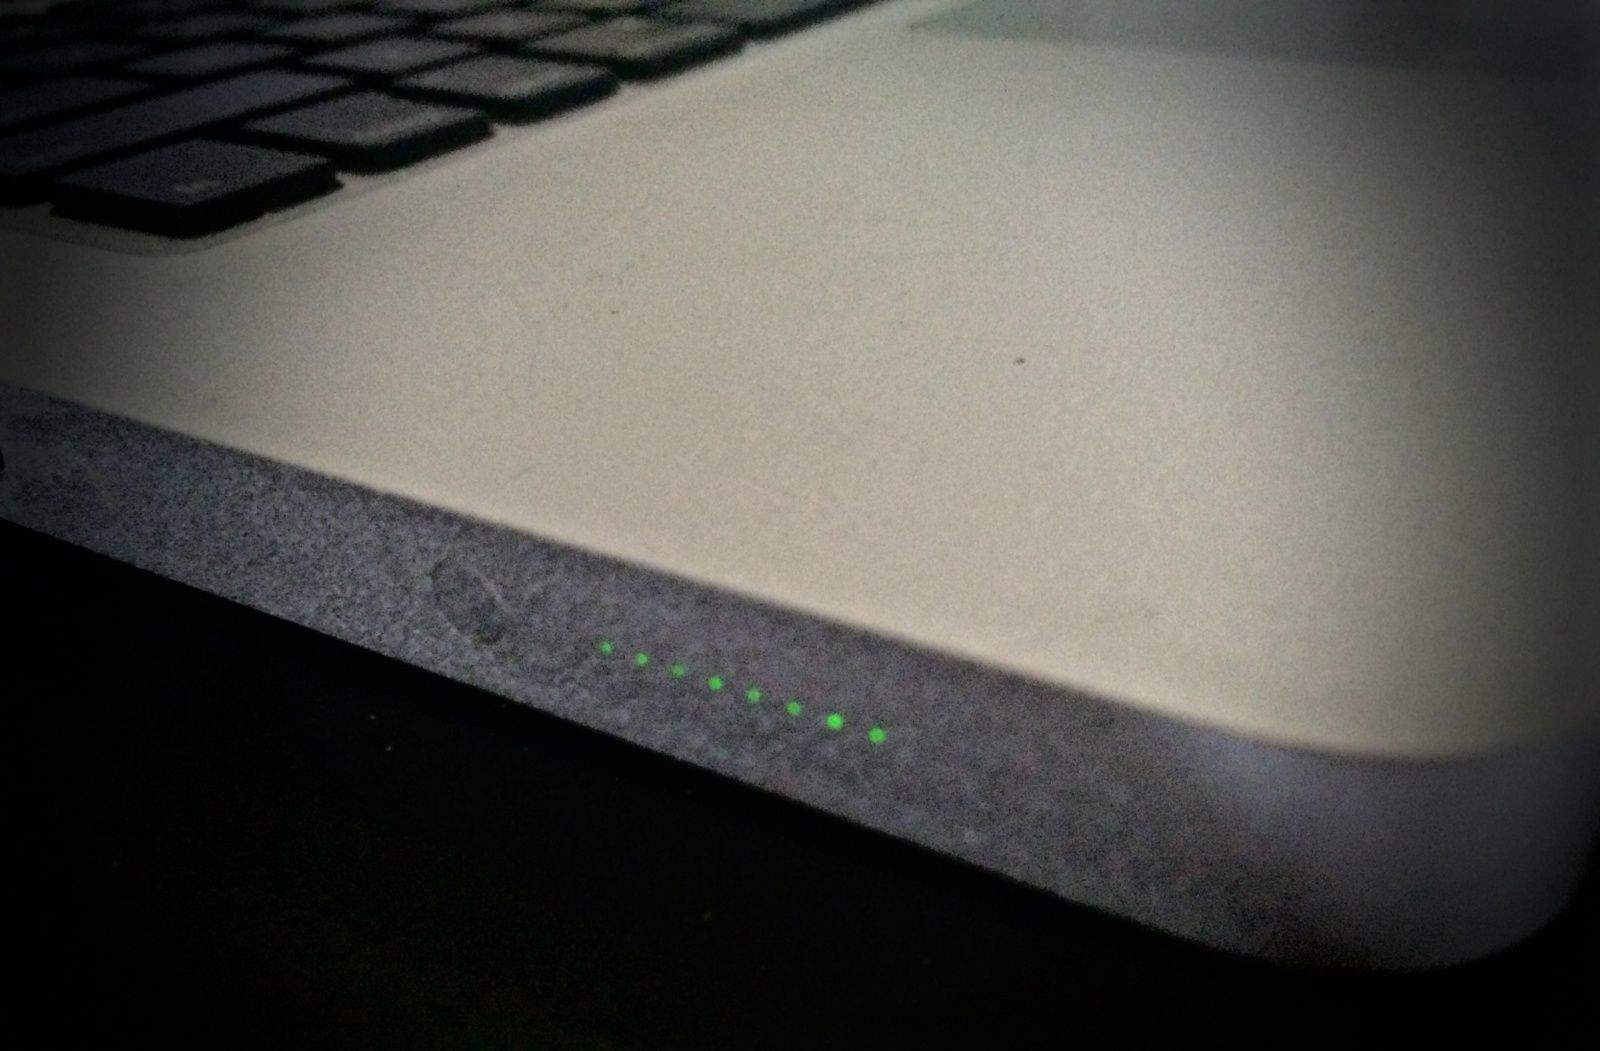 Macbook Pro battery indicator